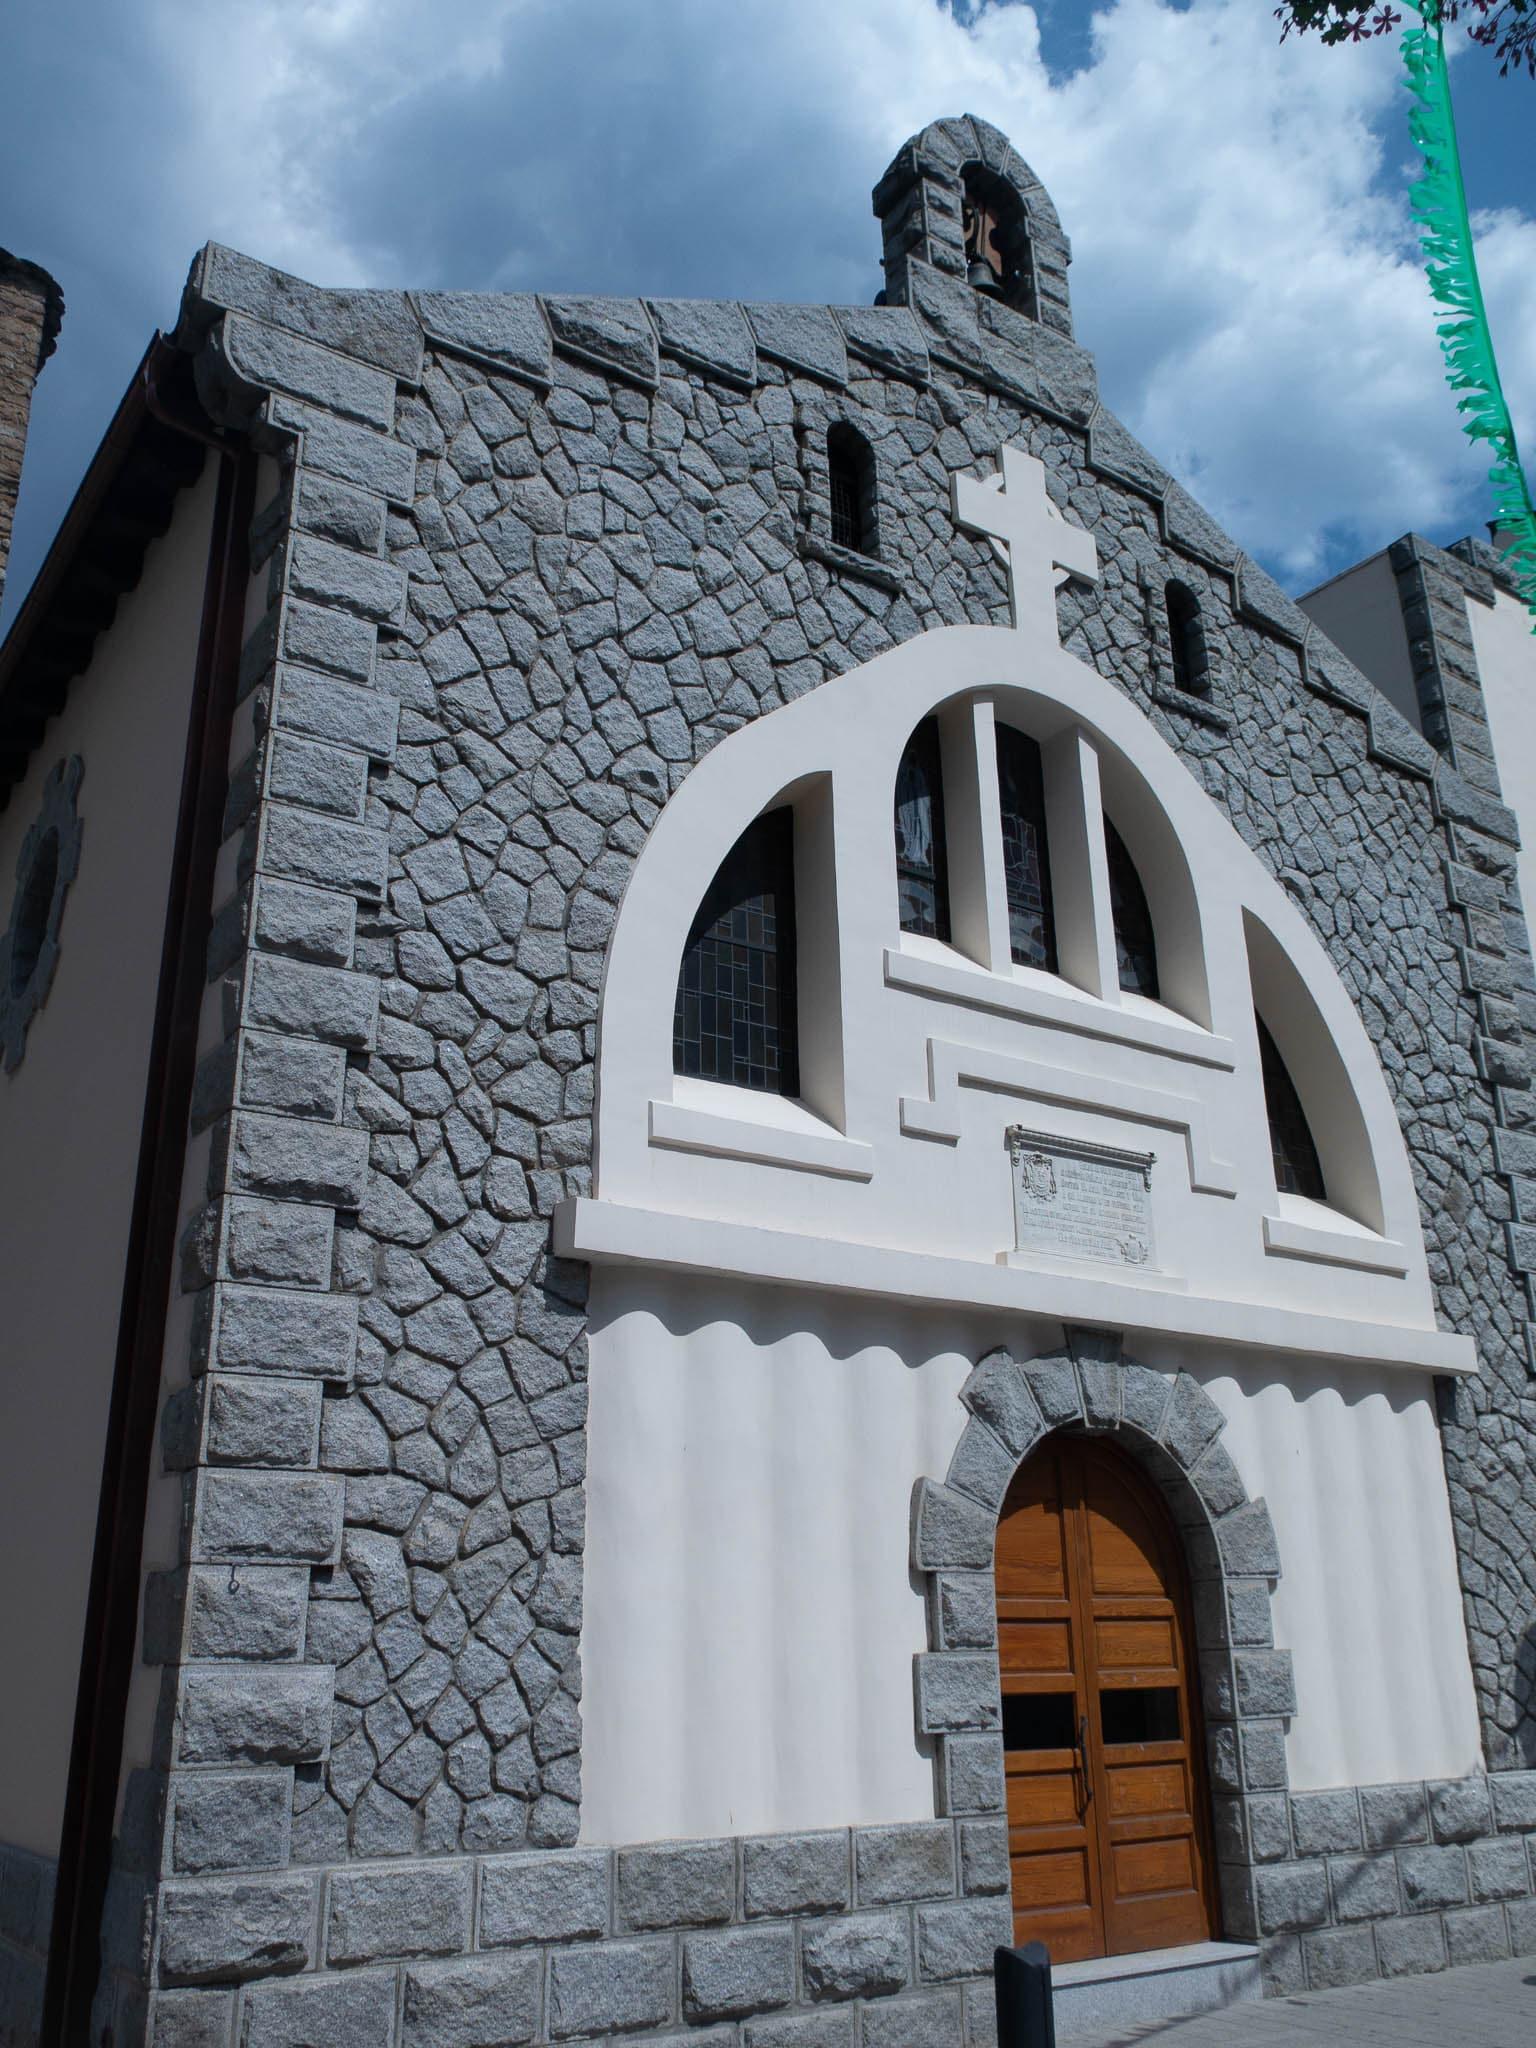 Kirche in Andorra, Sant Julia de Loria, außenansicht